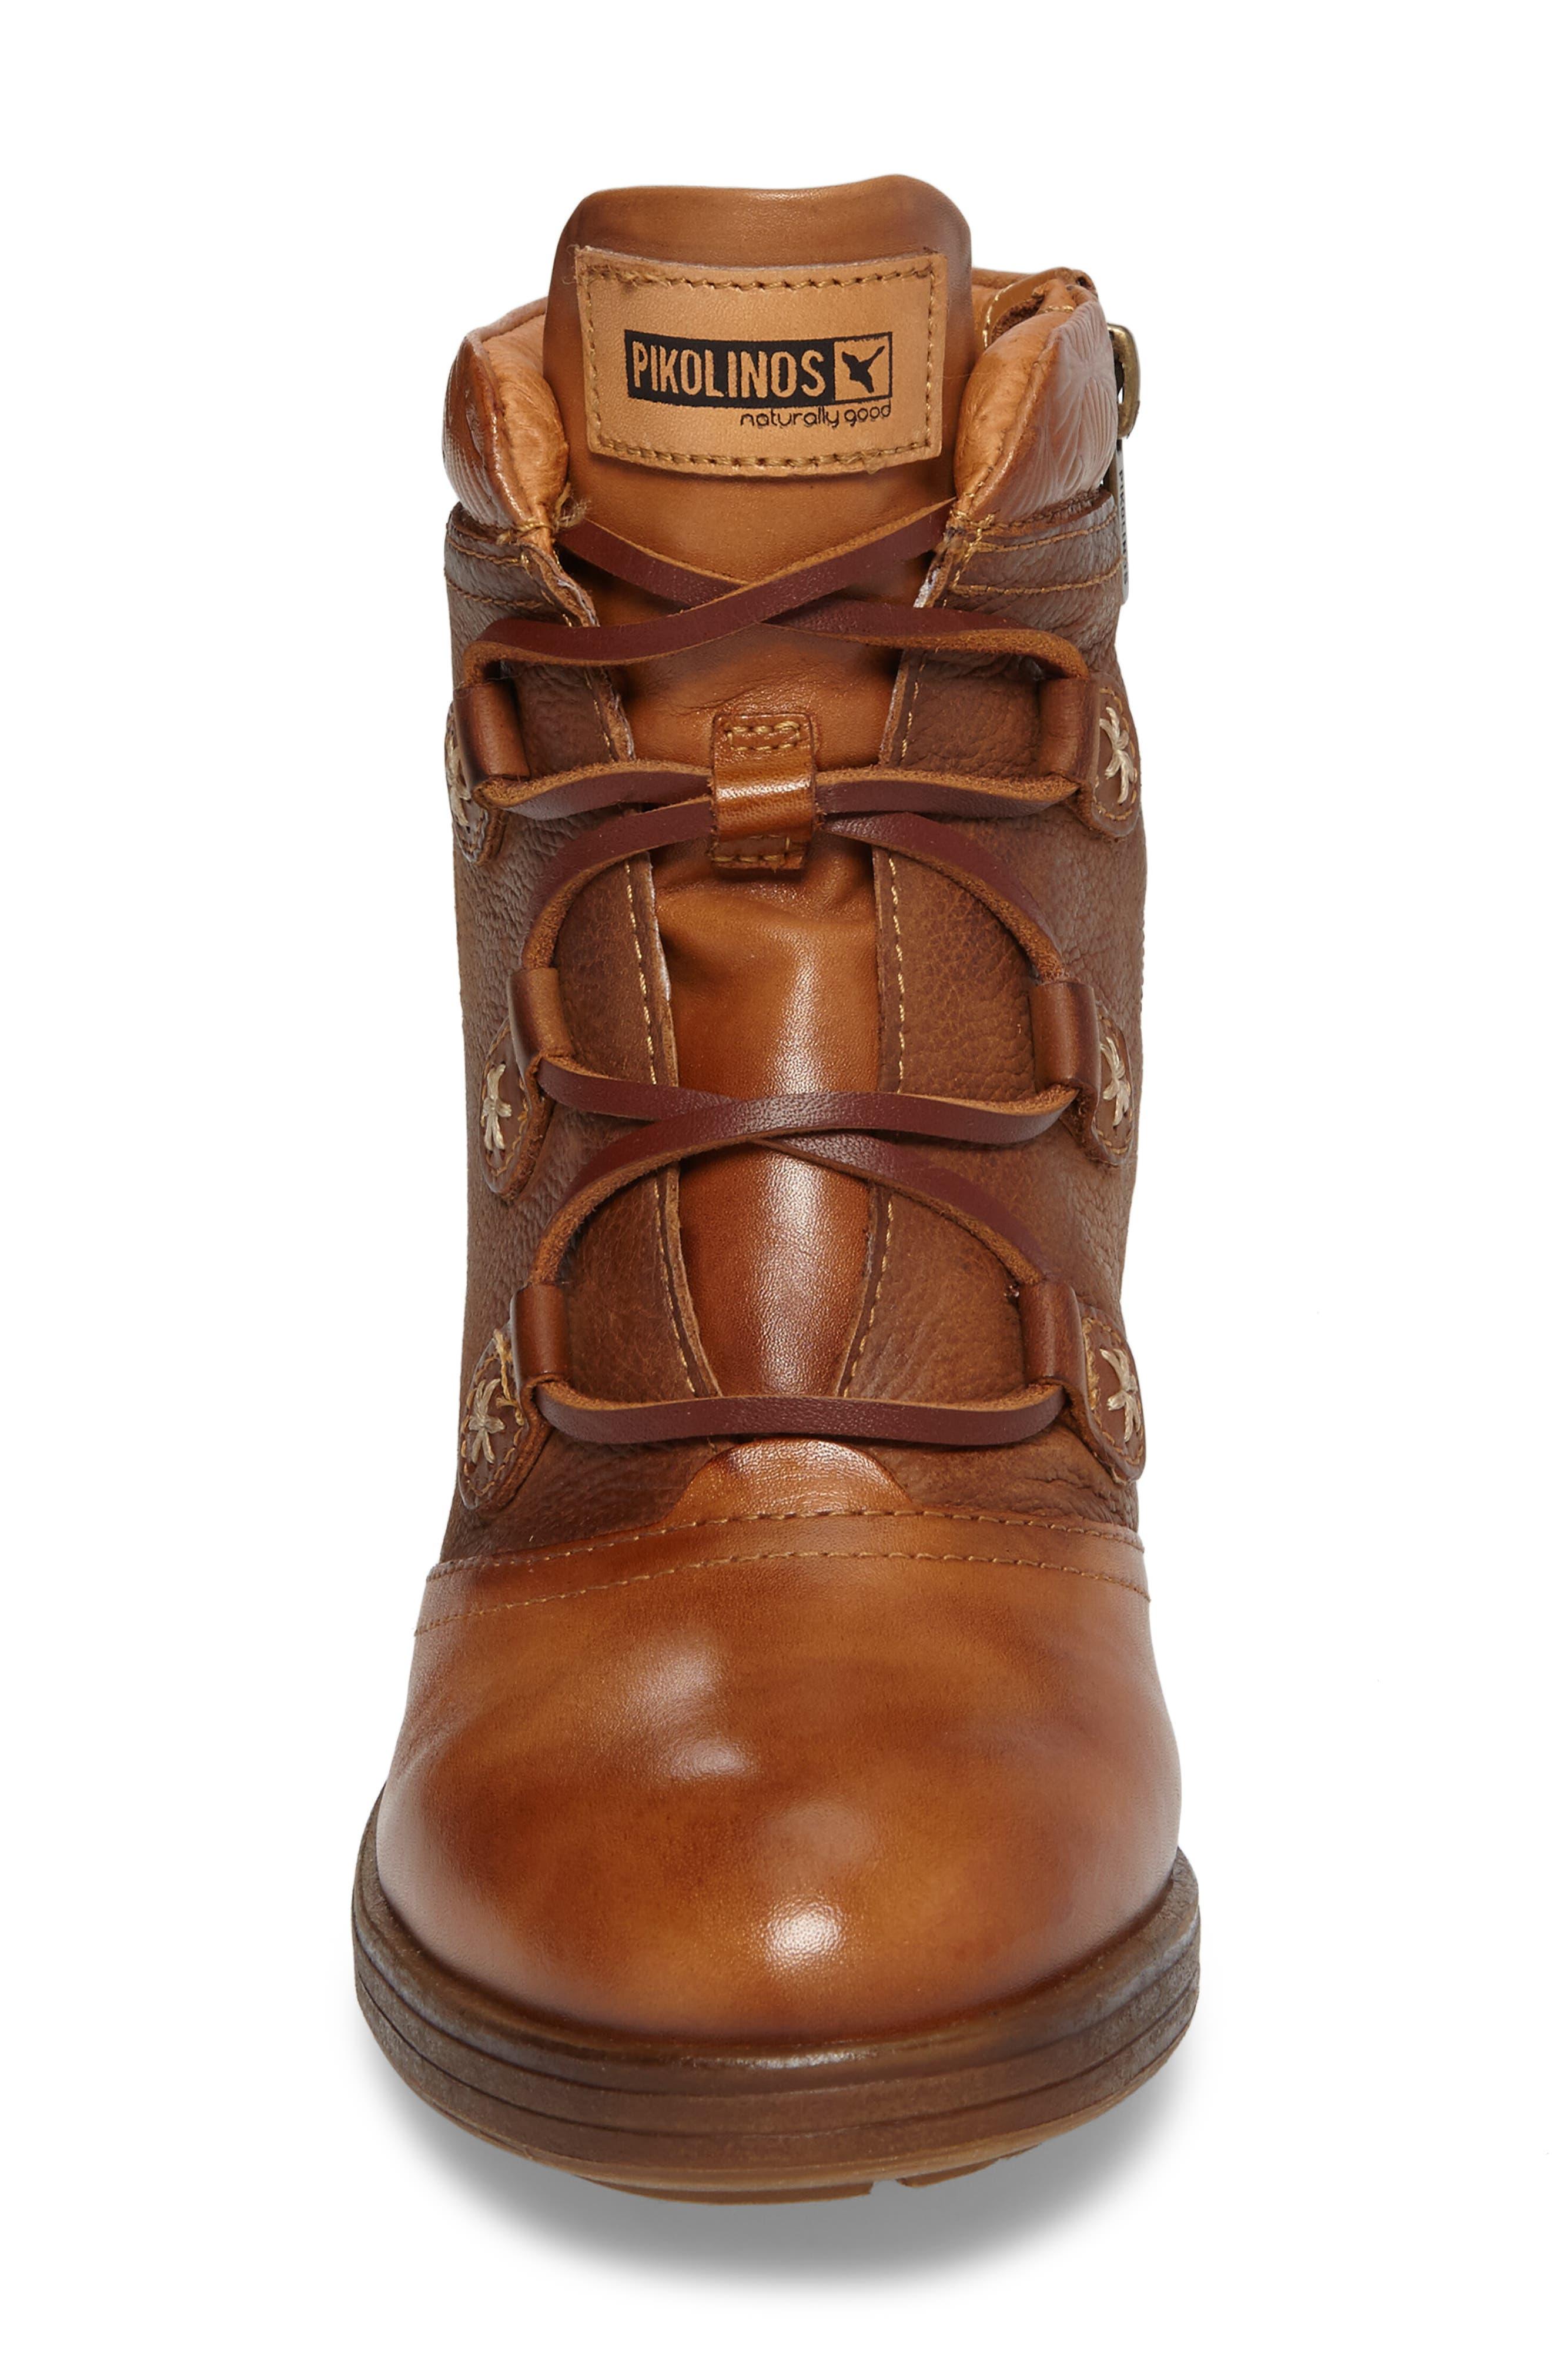 PIKOLINOS,                             Lyon Lace-Up Boot,                             Alternate thumbnail 4, color,                             207